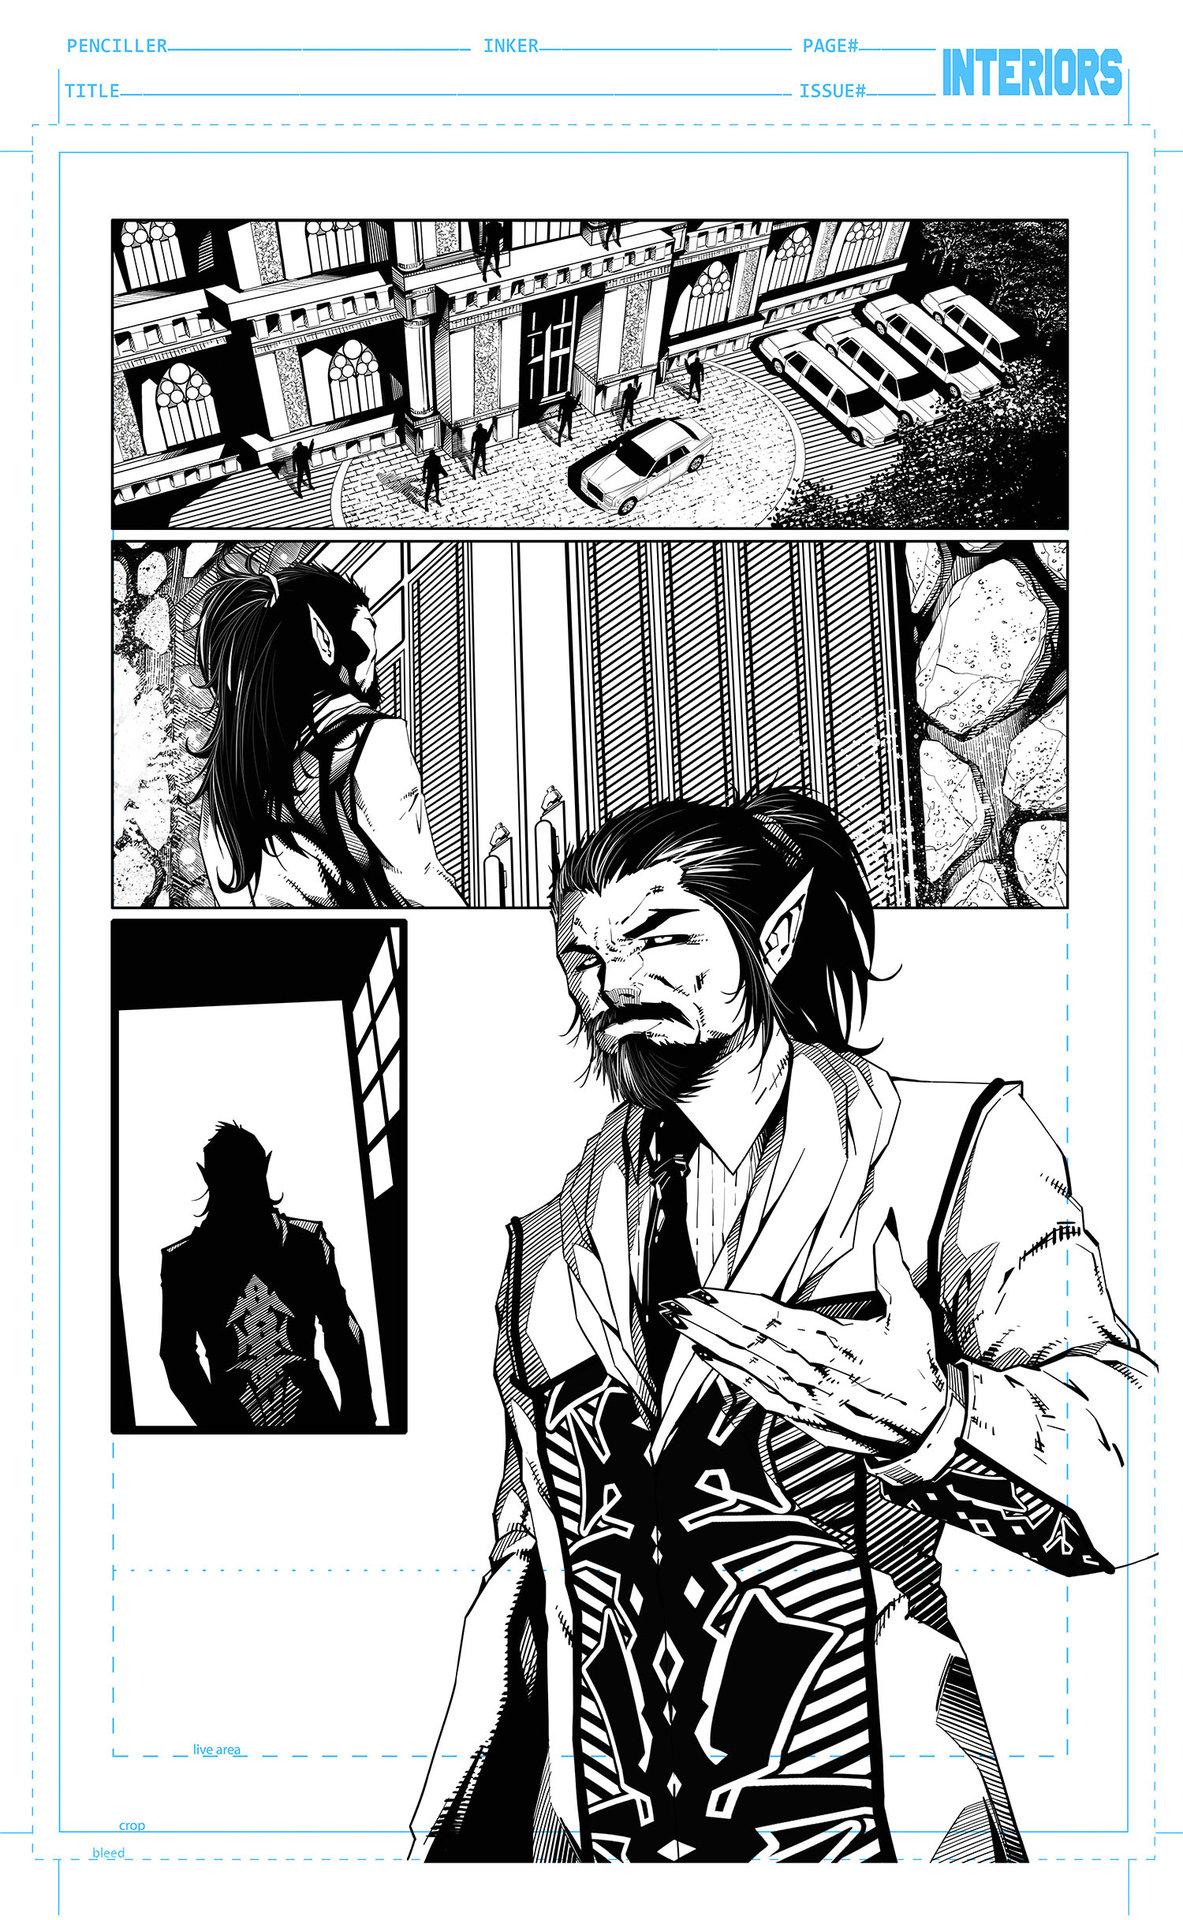 Kareem ahmed page 4 close